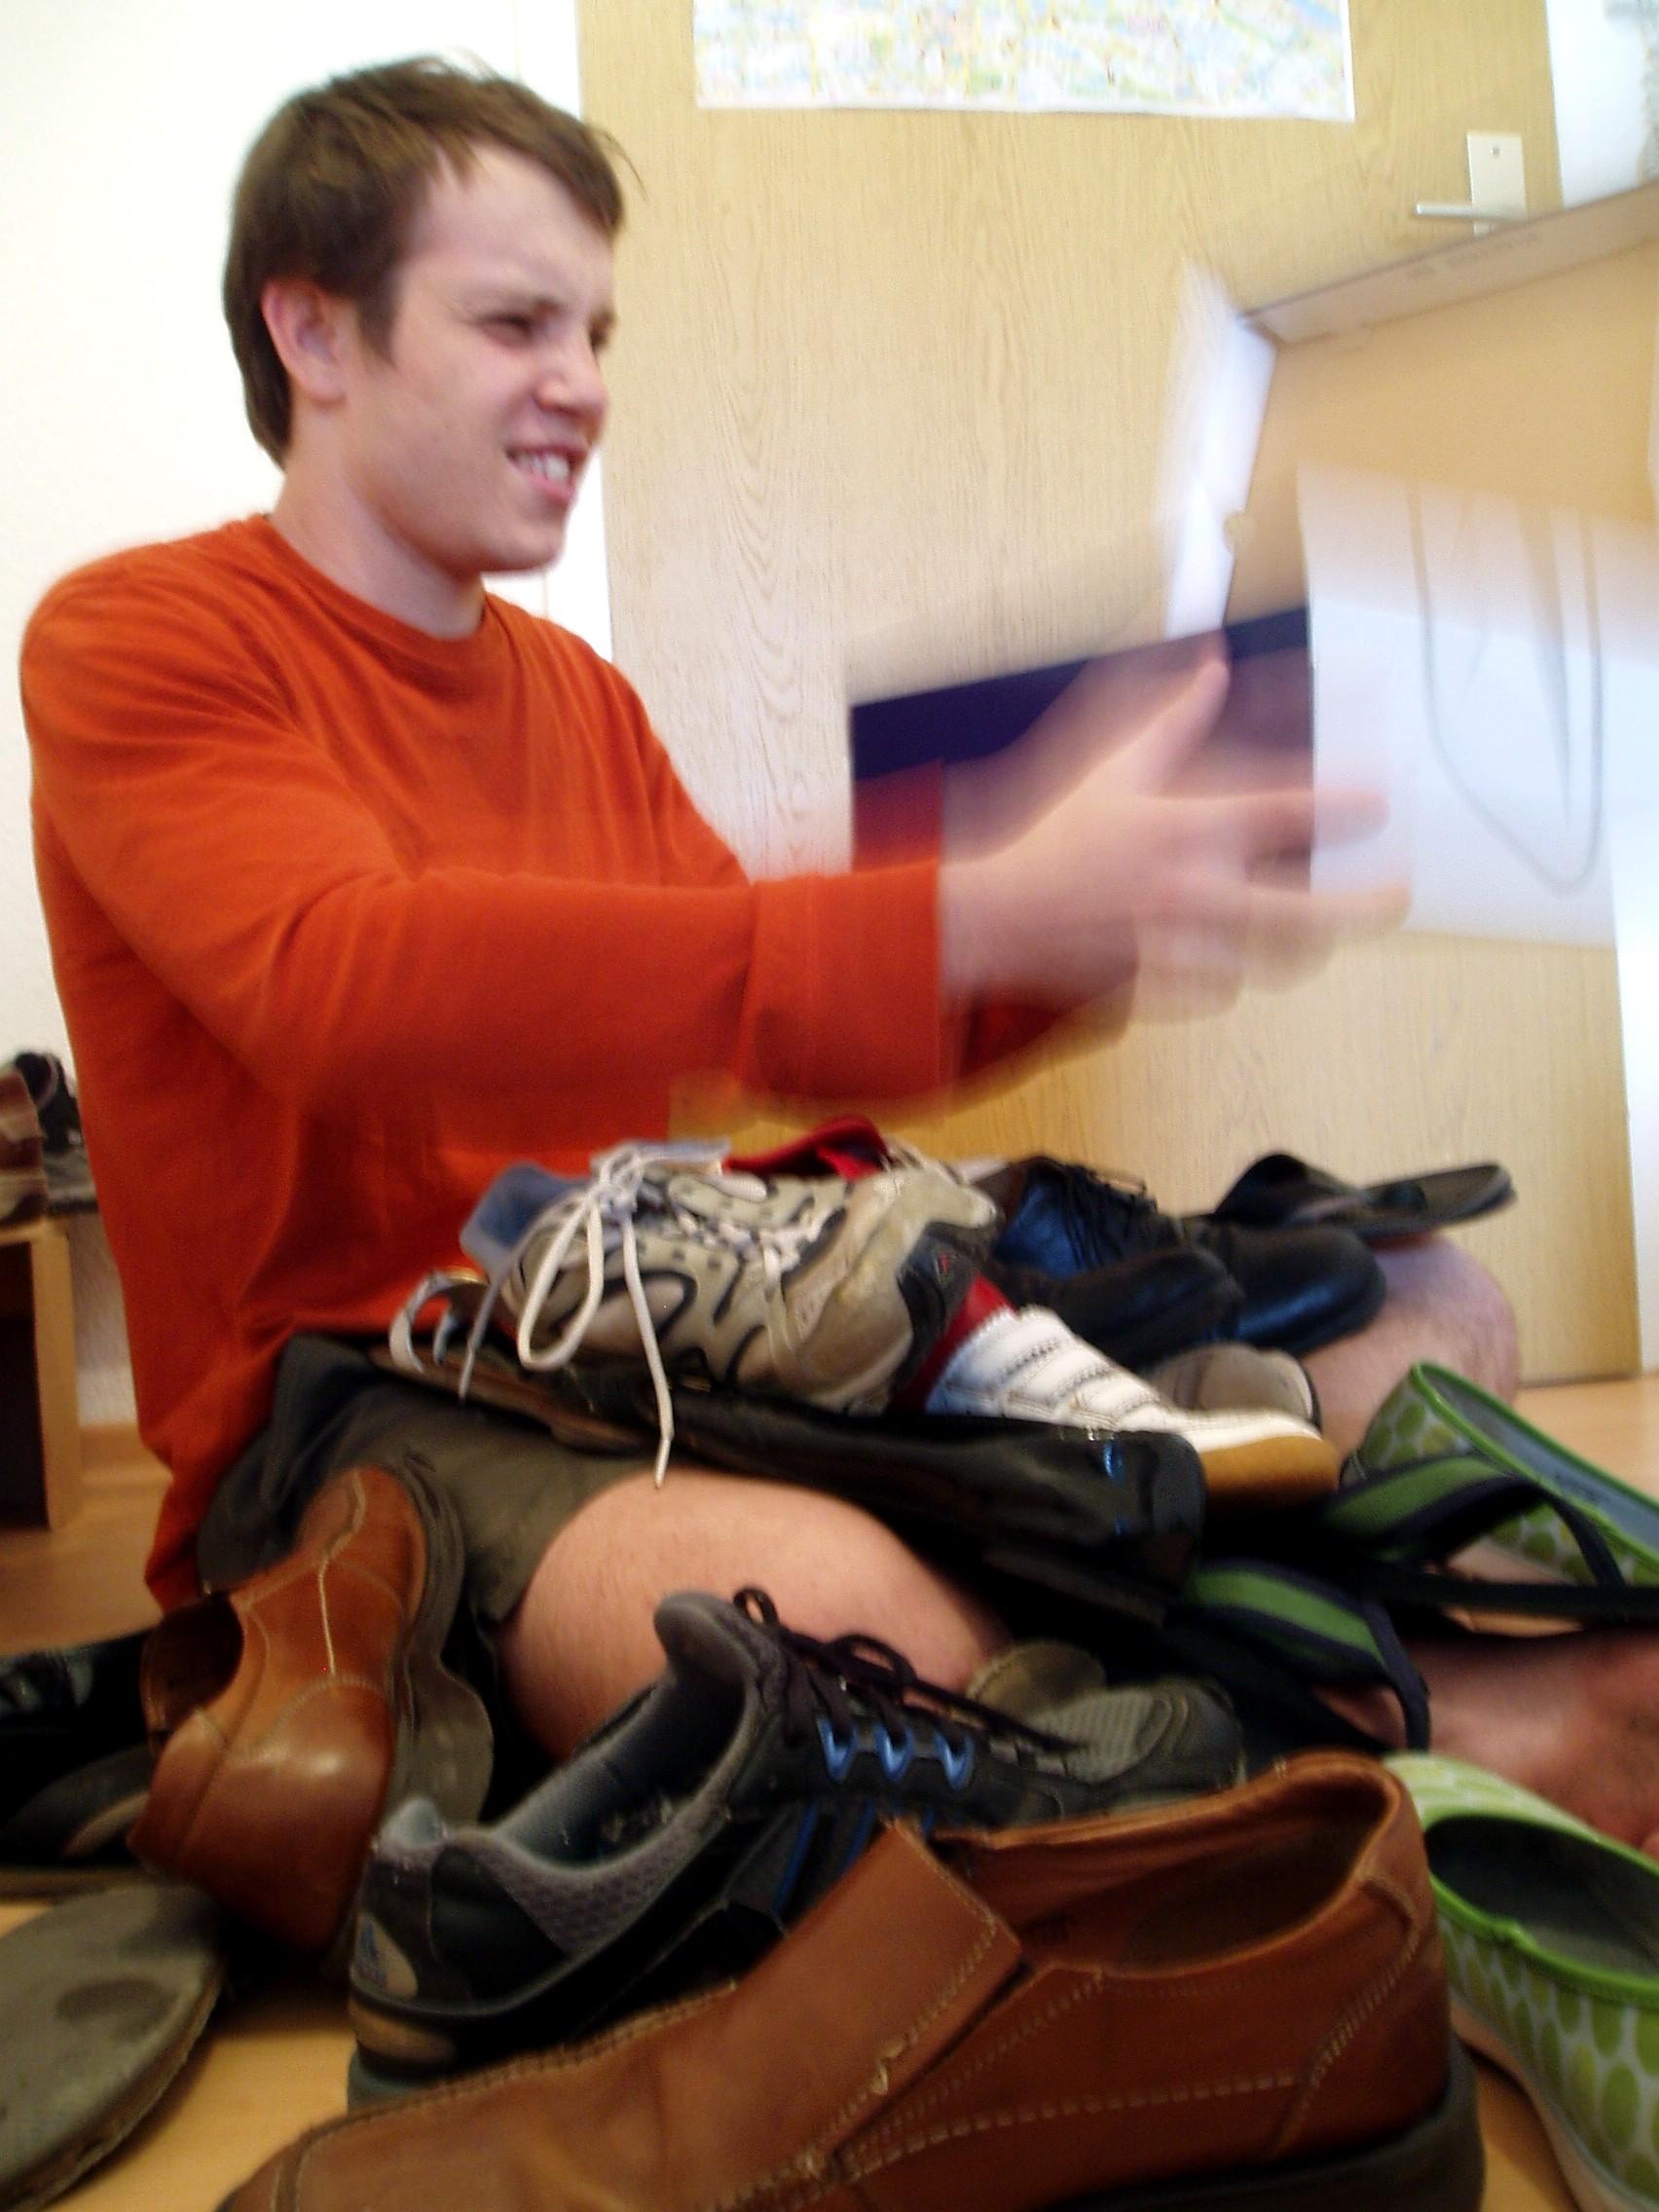 Dan's shoebox of receipts